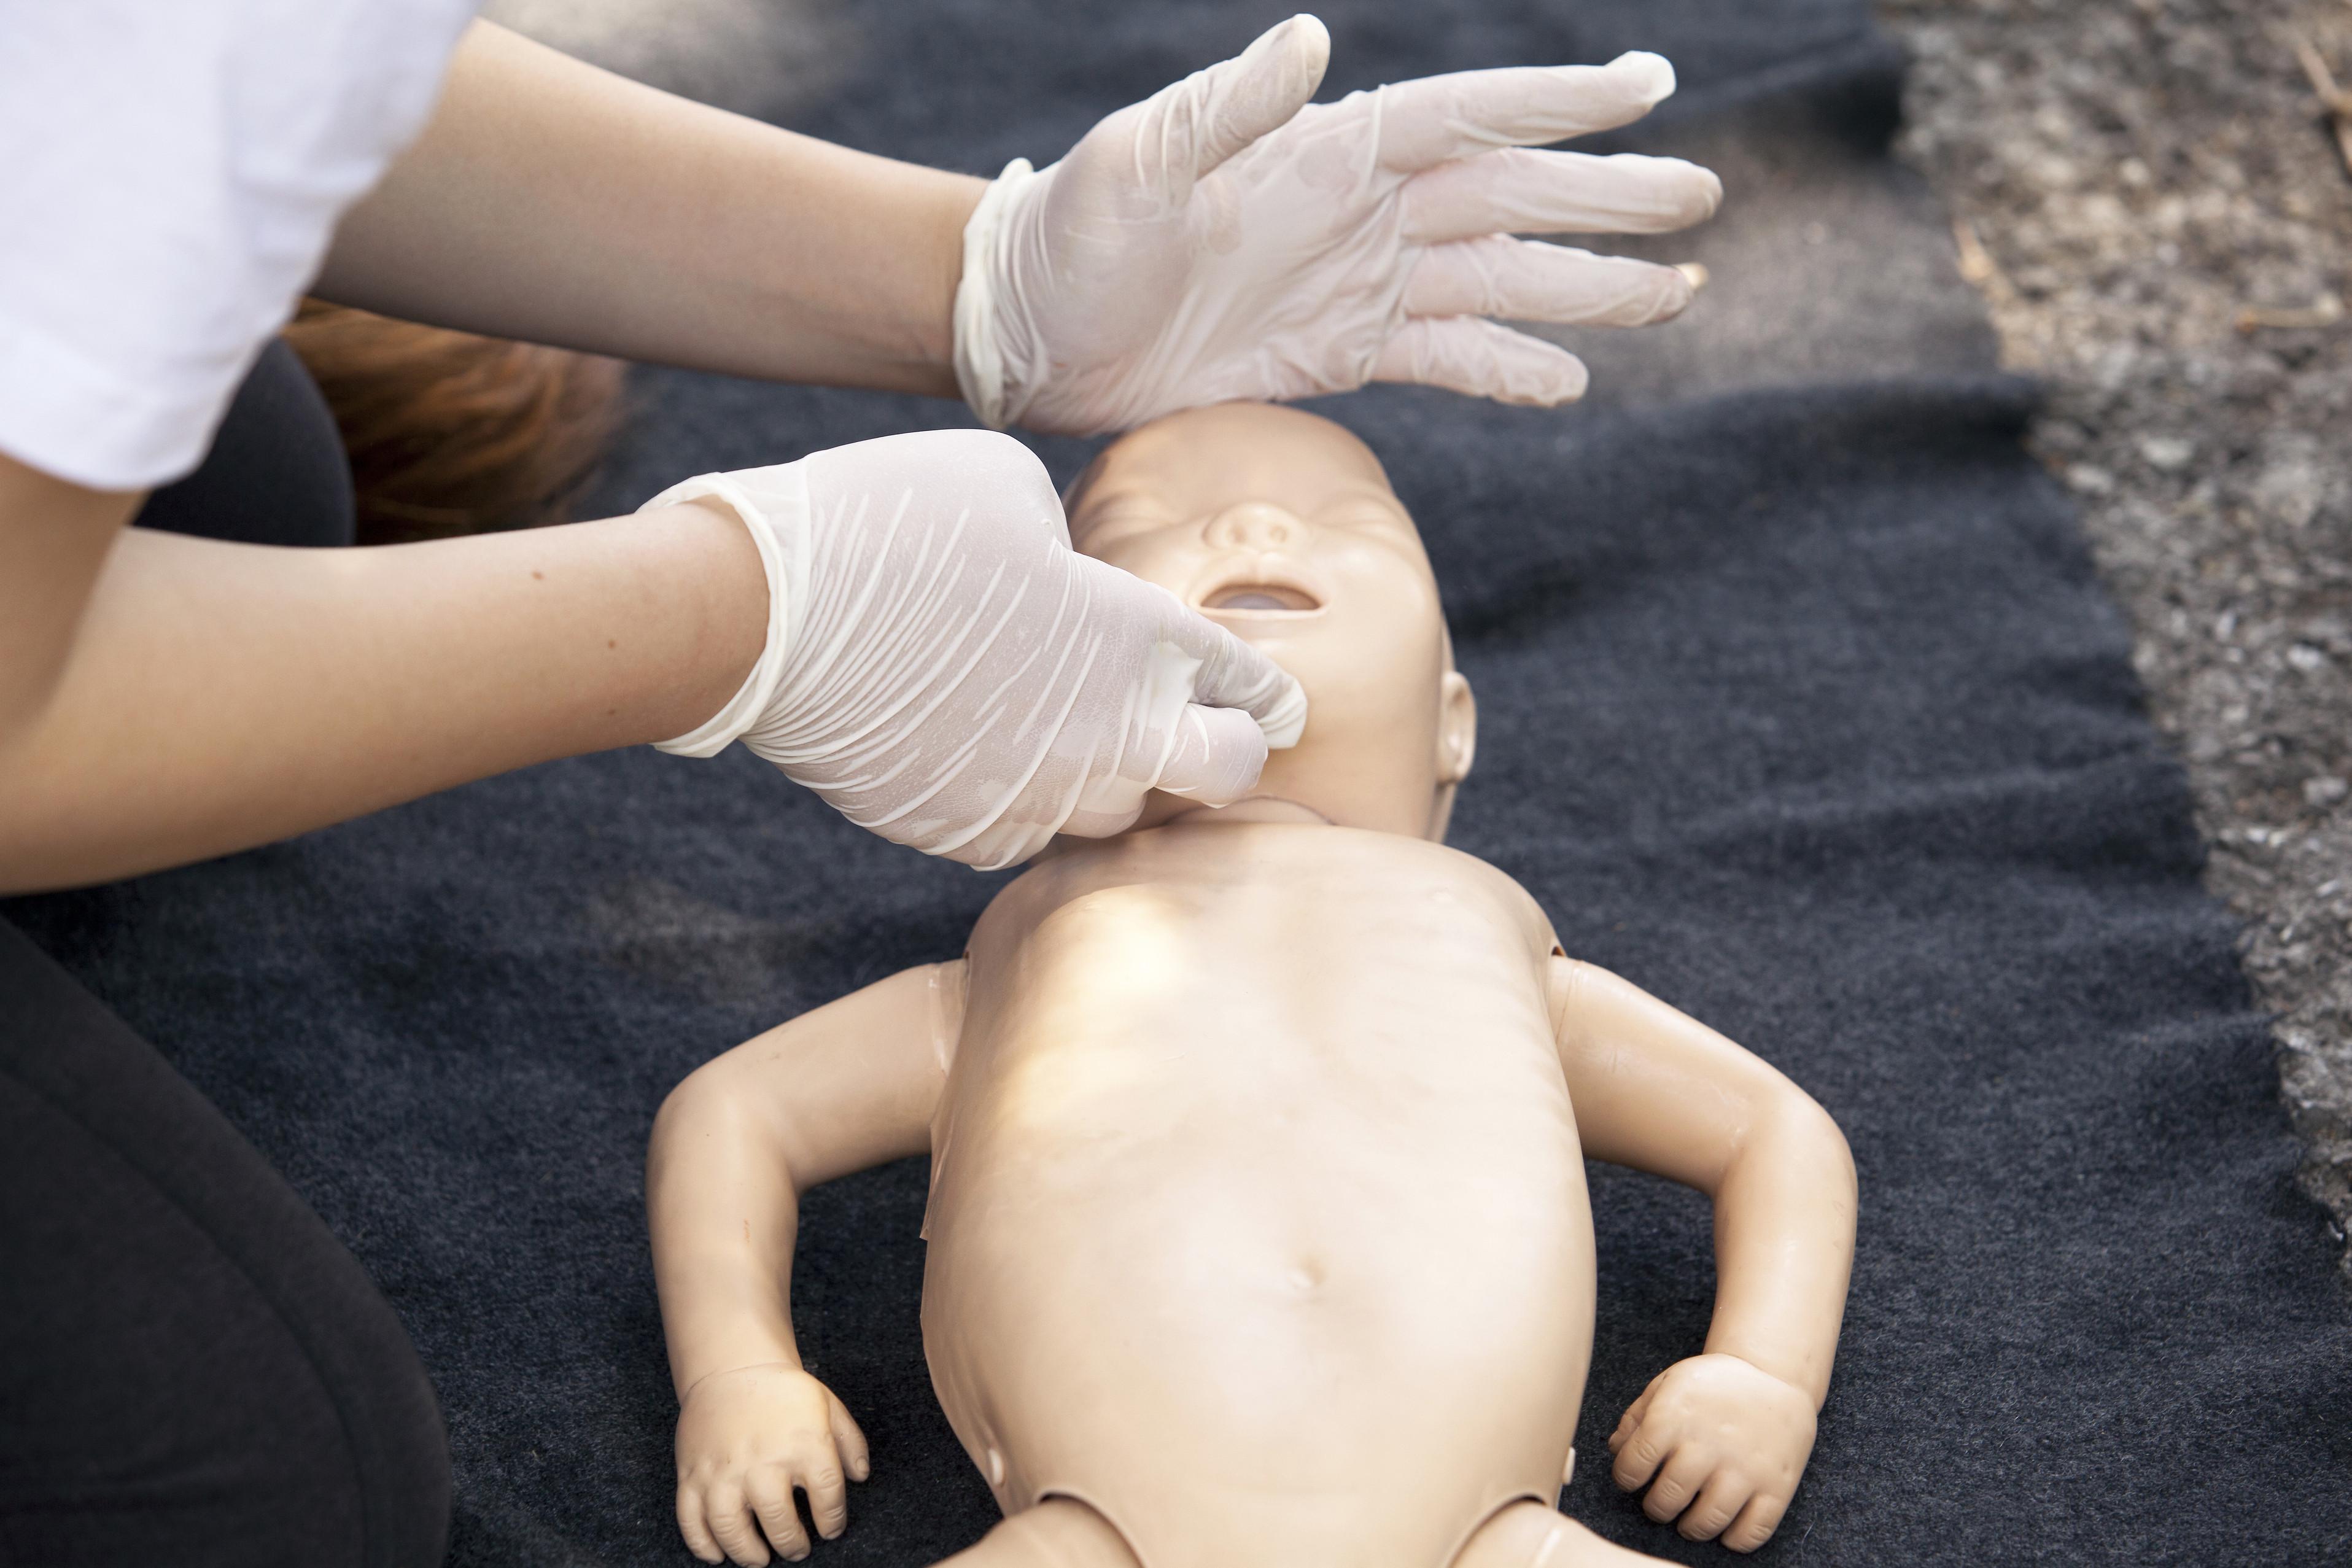 Pediatric Advanced Life Support Training - Trinity Training and Consultants, Ocala, FL